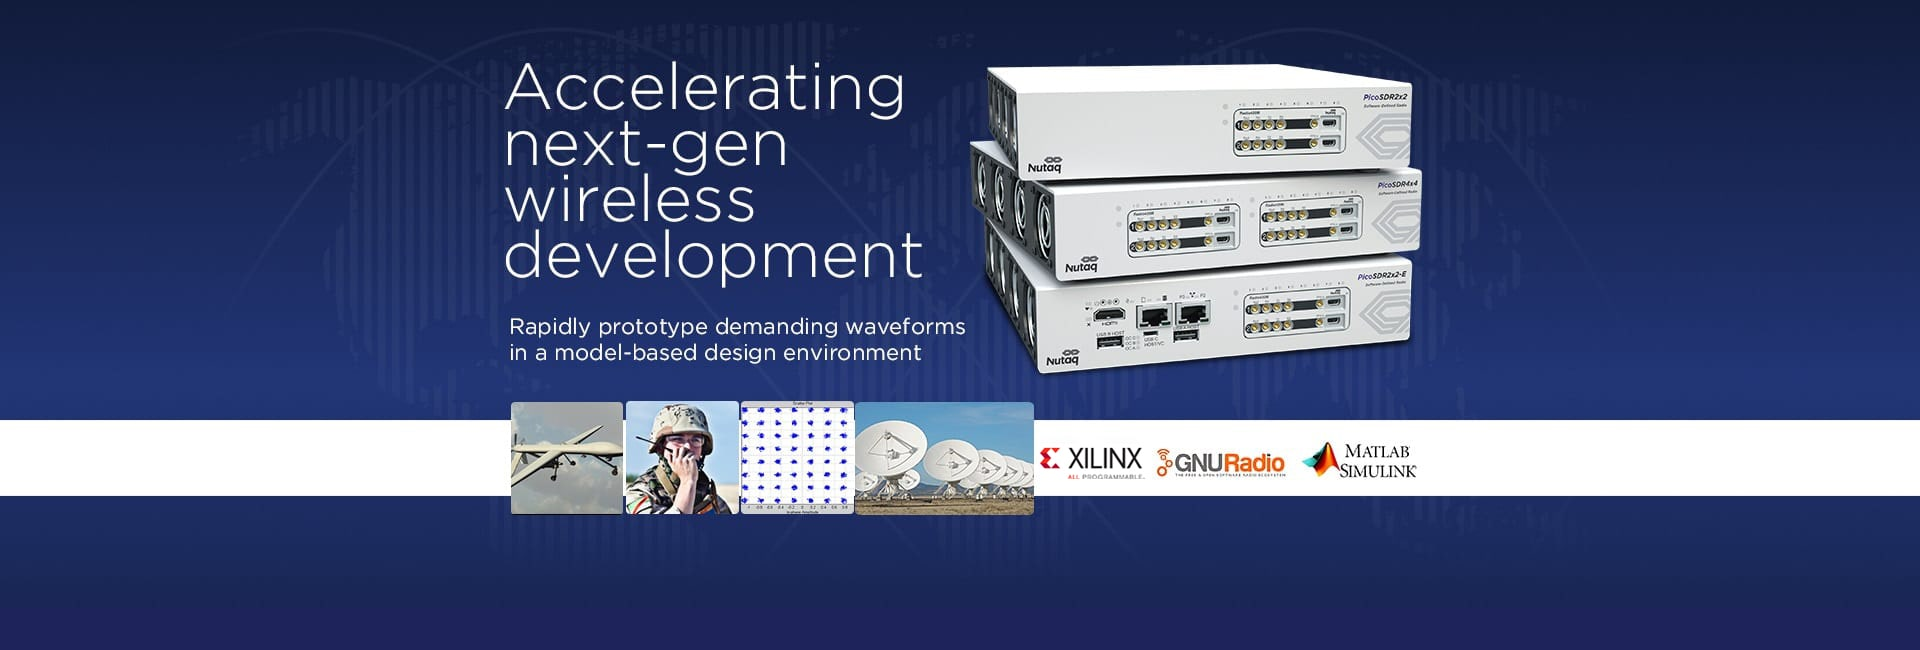 PicoSDR Series for Wireless Development